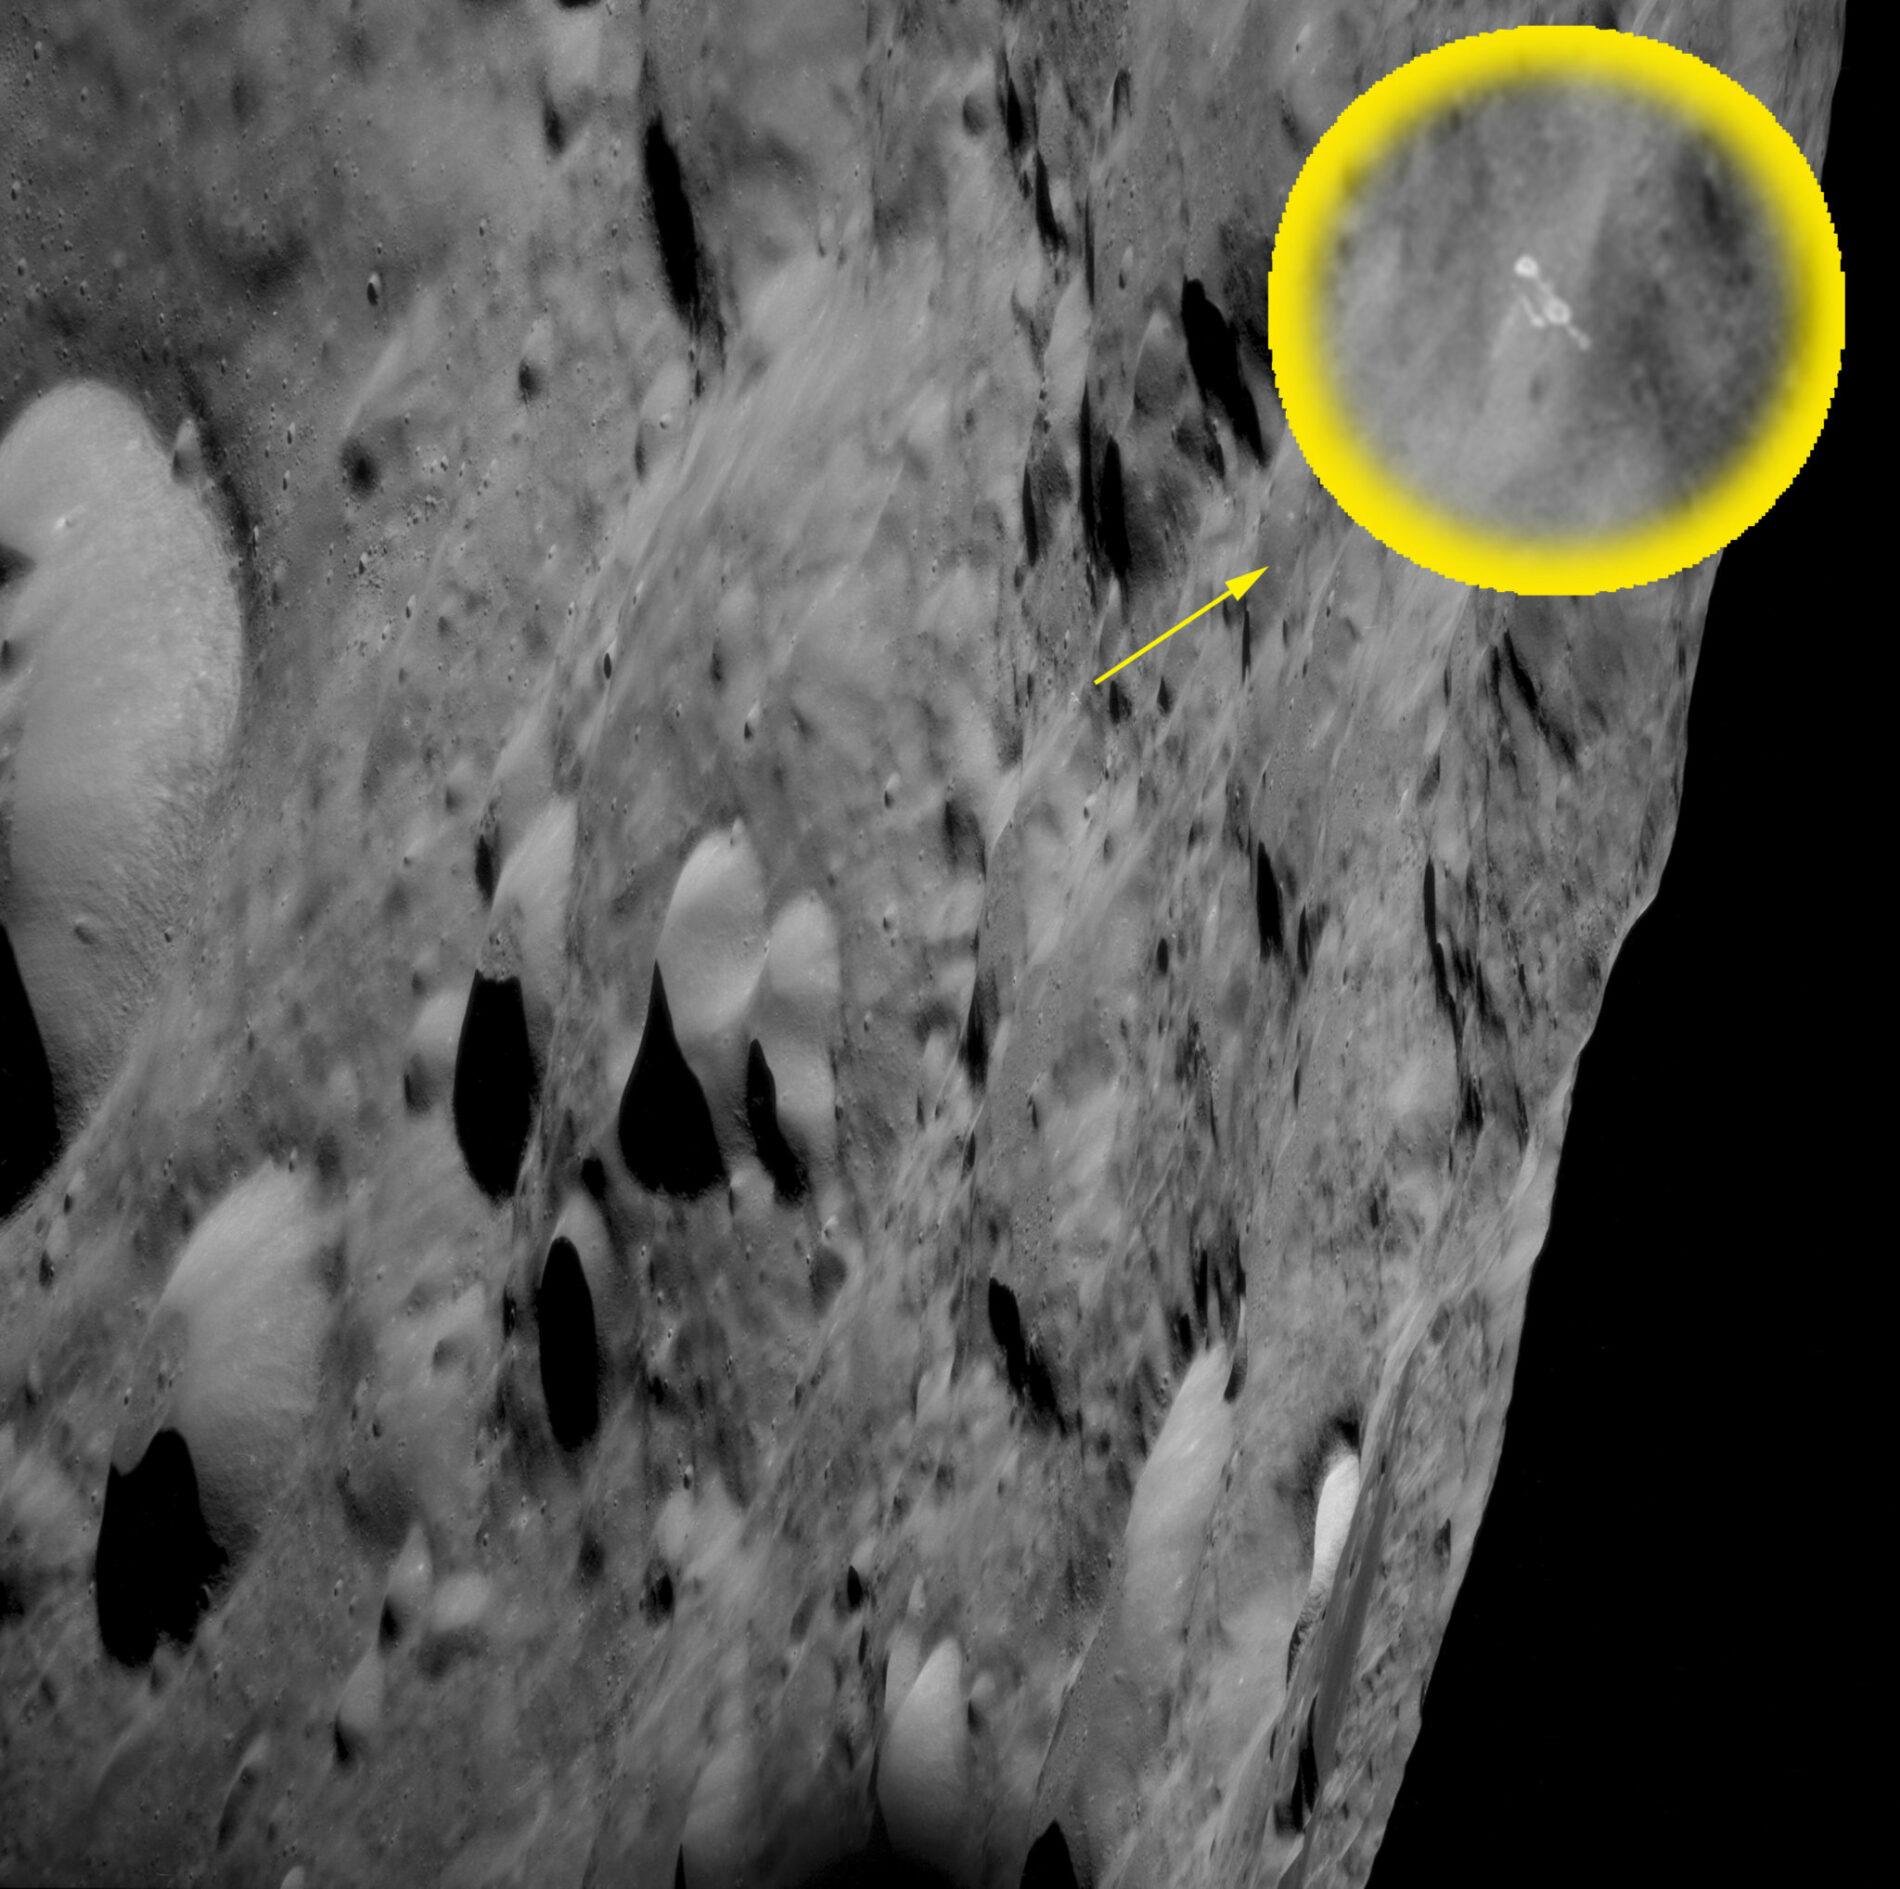 jc4 moon base location - photo #11